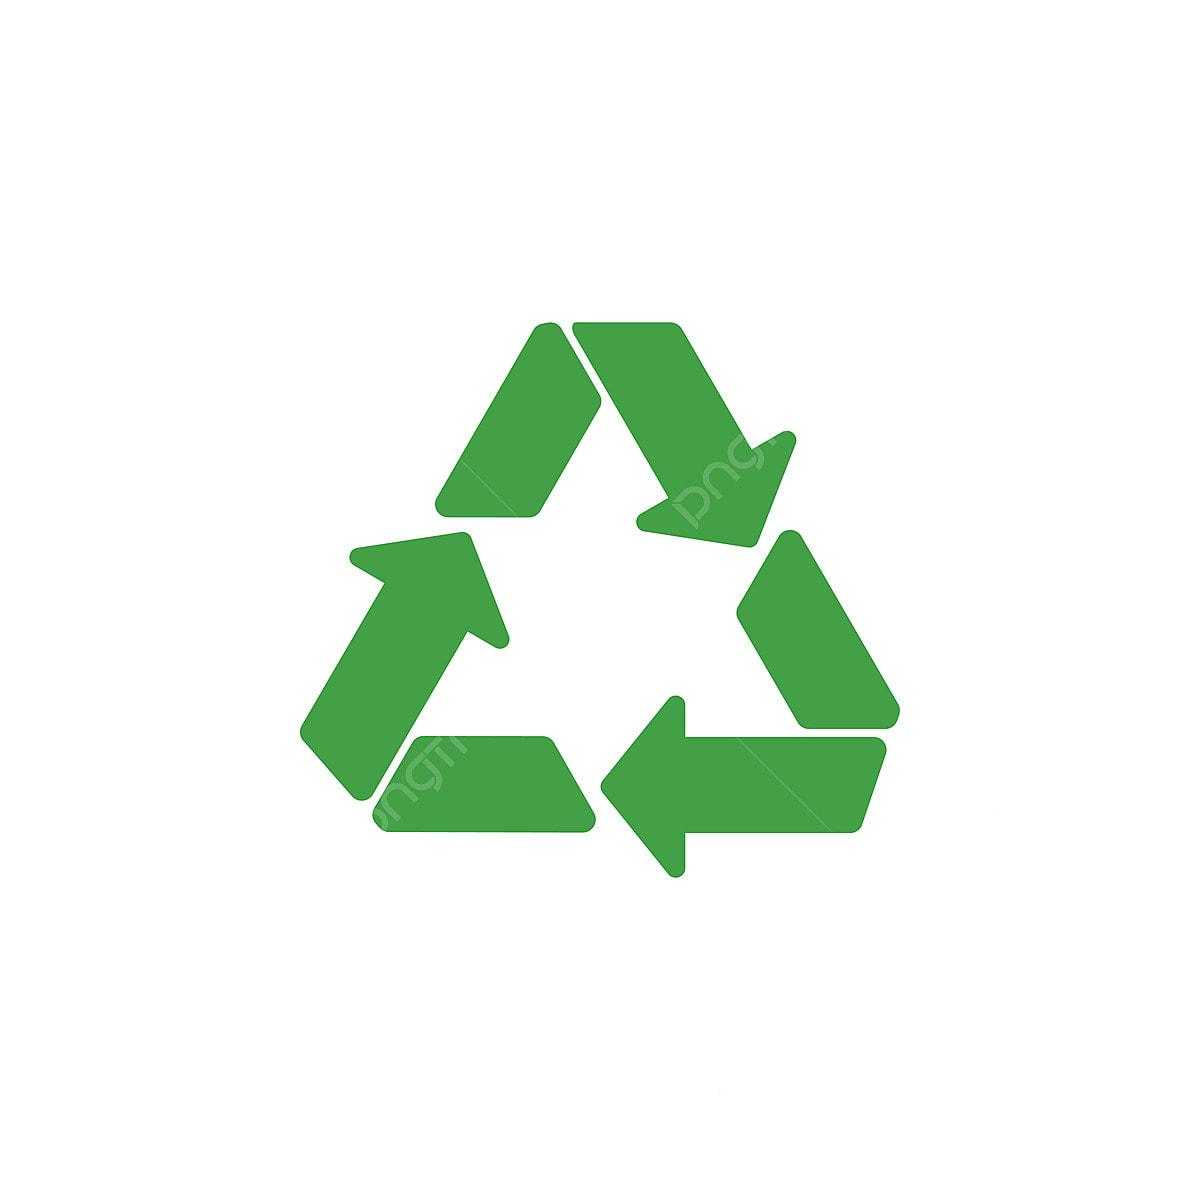 Recycle Symbol Graphic Design Template Vector, Symbol ...